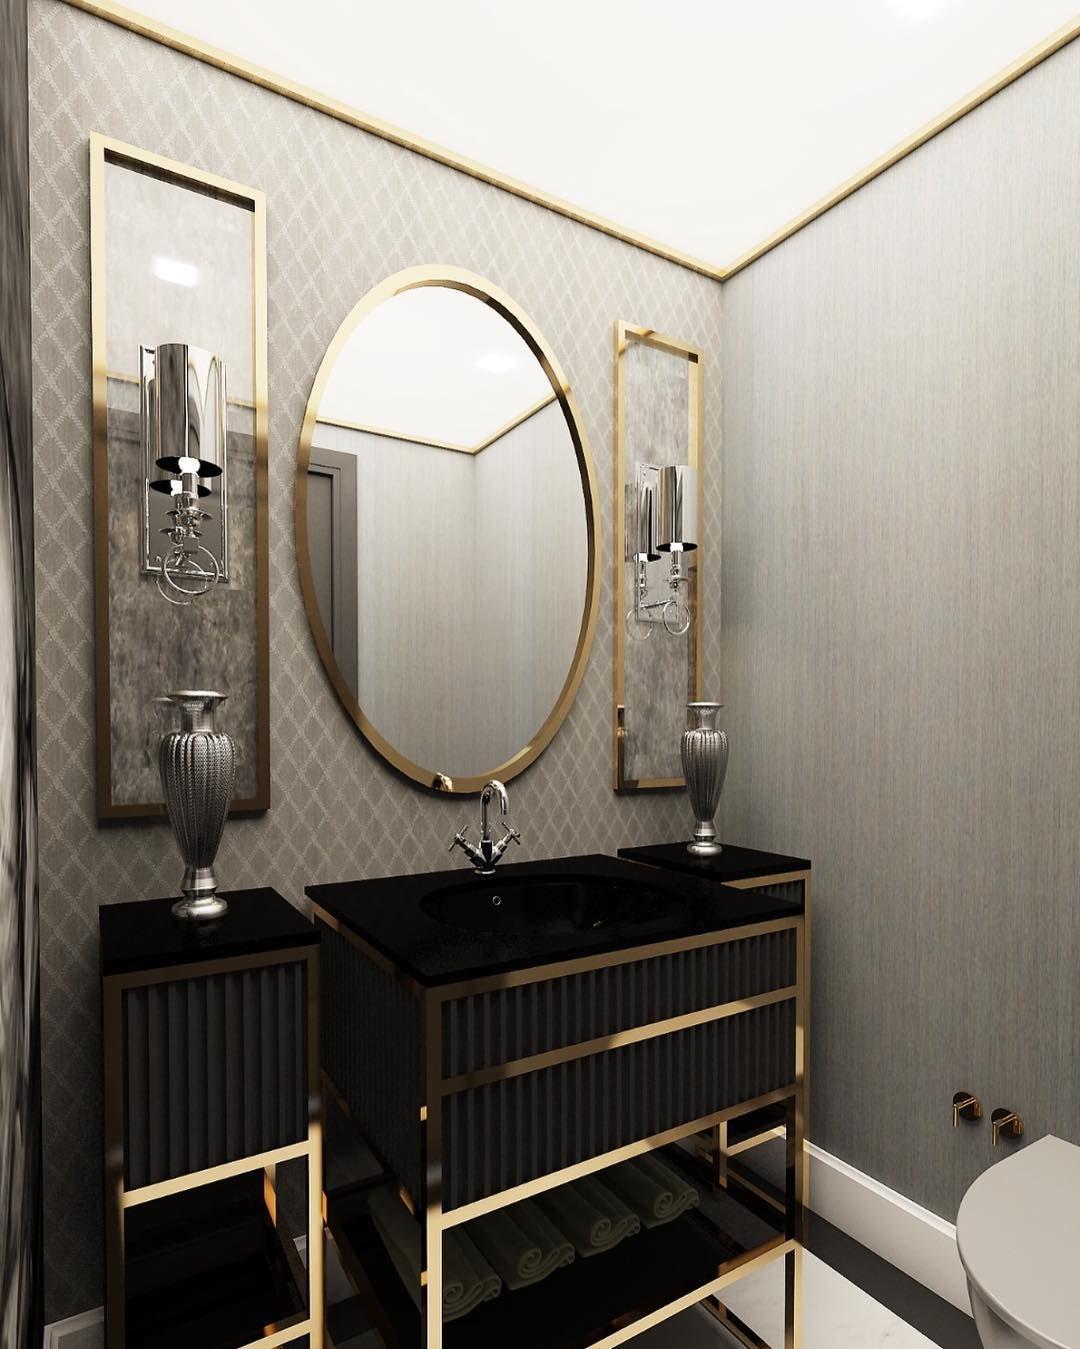 #ysdistanbul #yöntemsunar #design #designer #interiordesign #interior #interiors #interiør #interiordesigner #art #bathroom #mirrors #furniture #marbel #moscow #dubai #baku #newyork #toronto #california #london #paris #istanbul